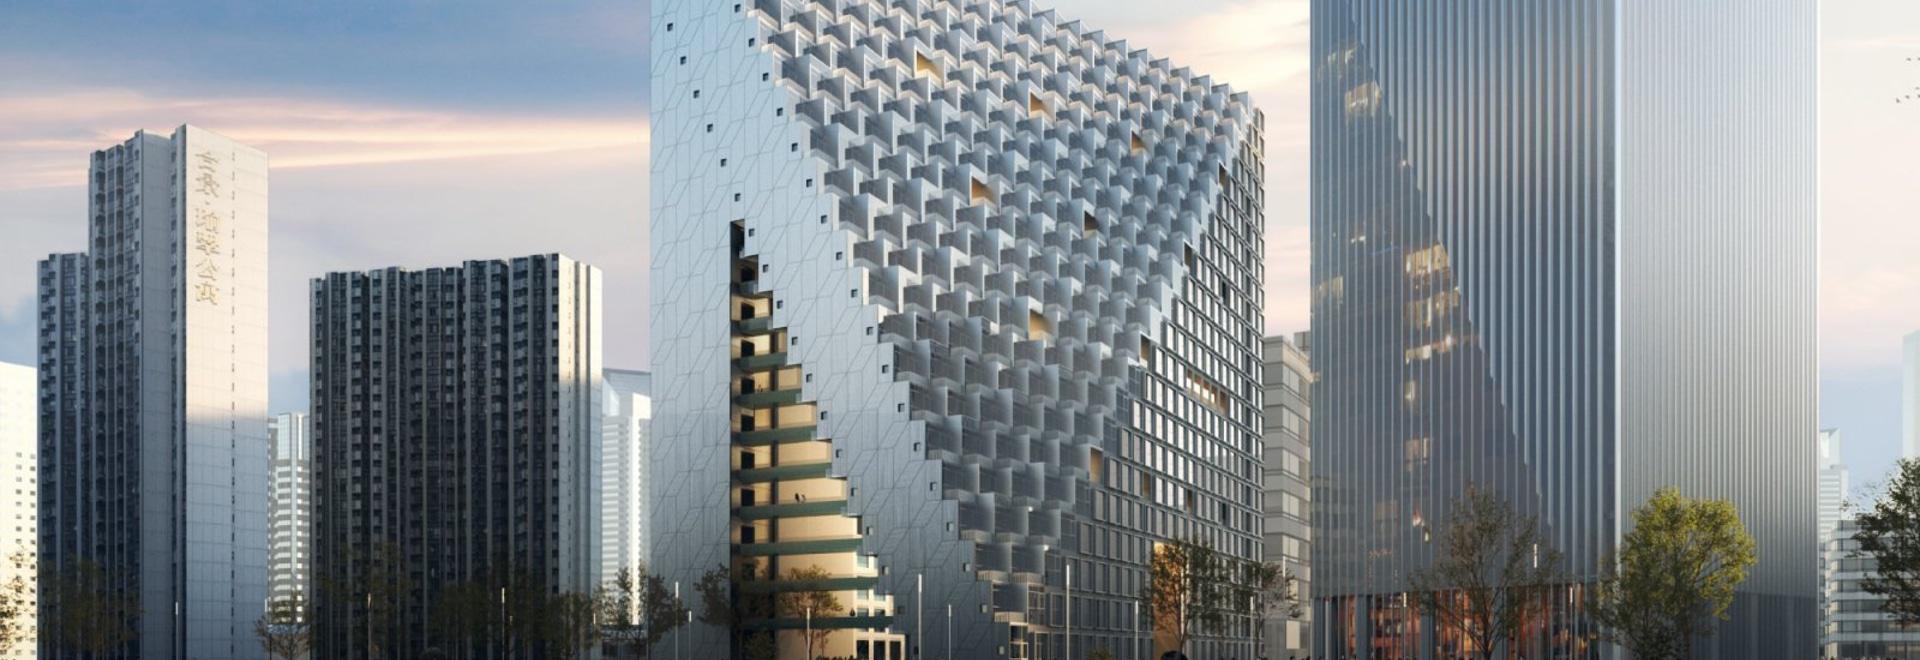 Xinhu Hangzhou Prism by OMA / Chris van Duijn breaks ground